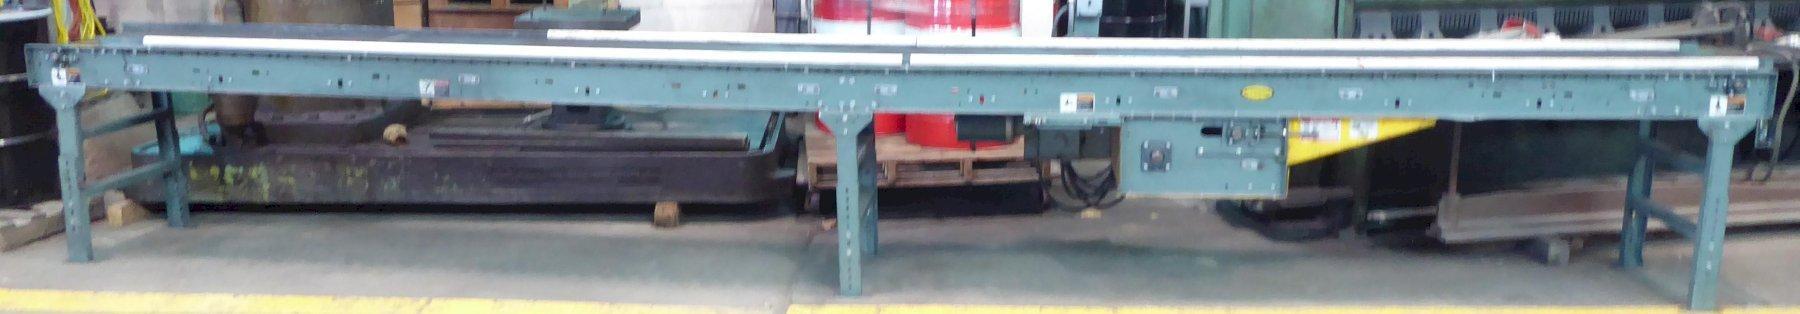 Hytrol Belt Conveyor: 18″W x 20'L, Power, Adjustable Height